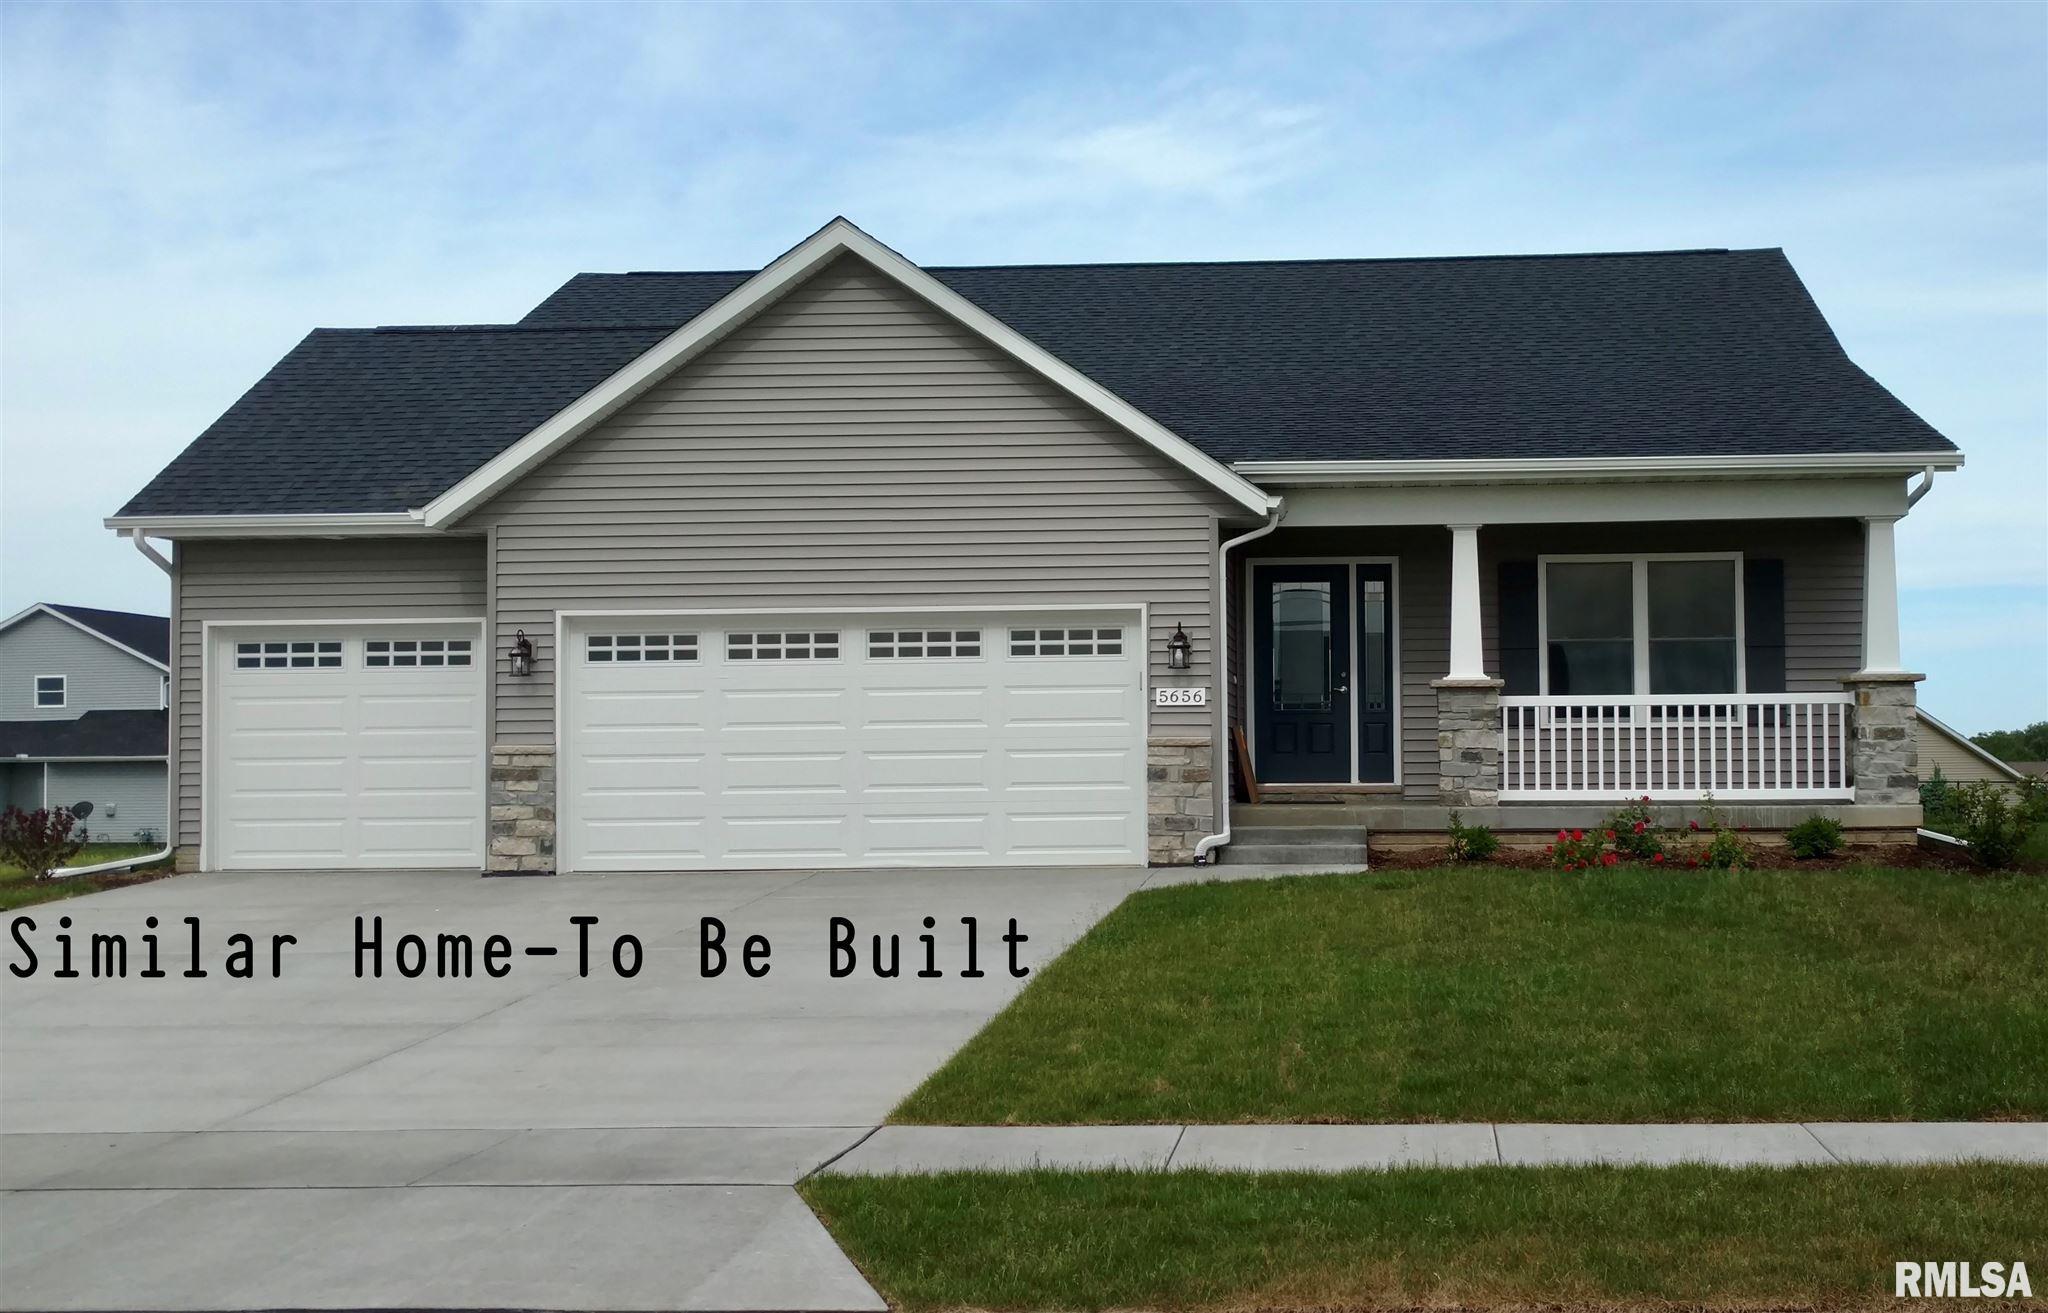 4703 W 12TH Property Photo - Davenport, IA real estate listing